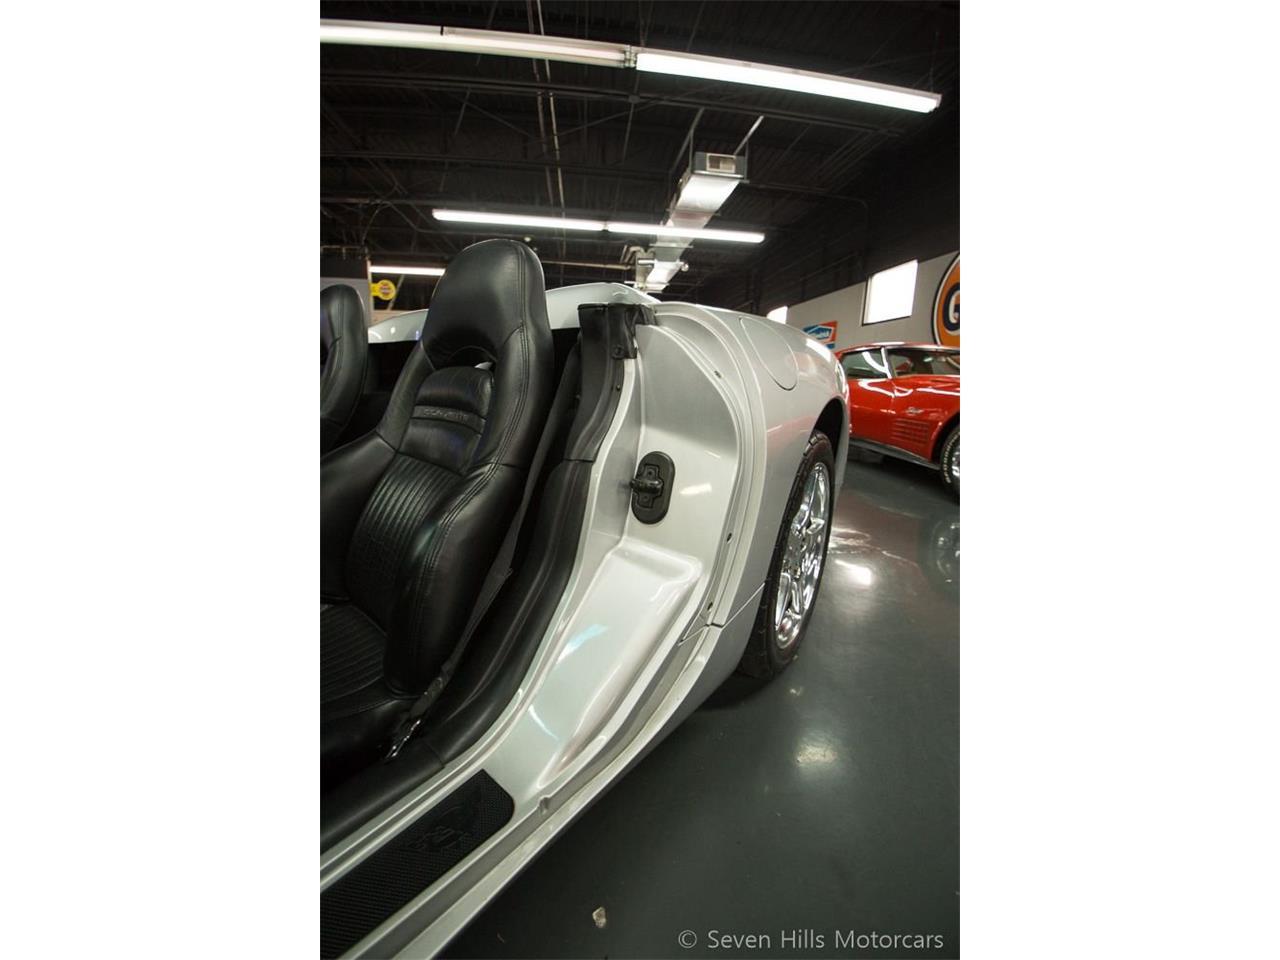 2000 Chevrolet Corvette (CC-1312594) for sale in Cincinnati, Ohio